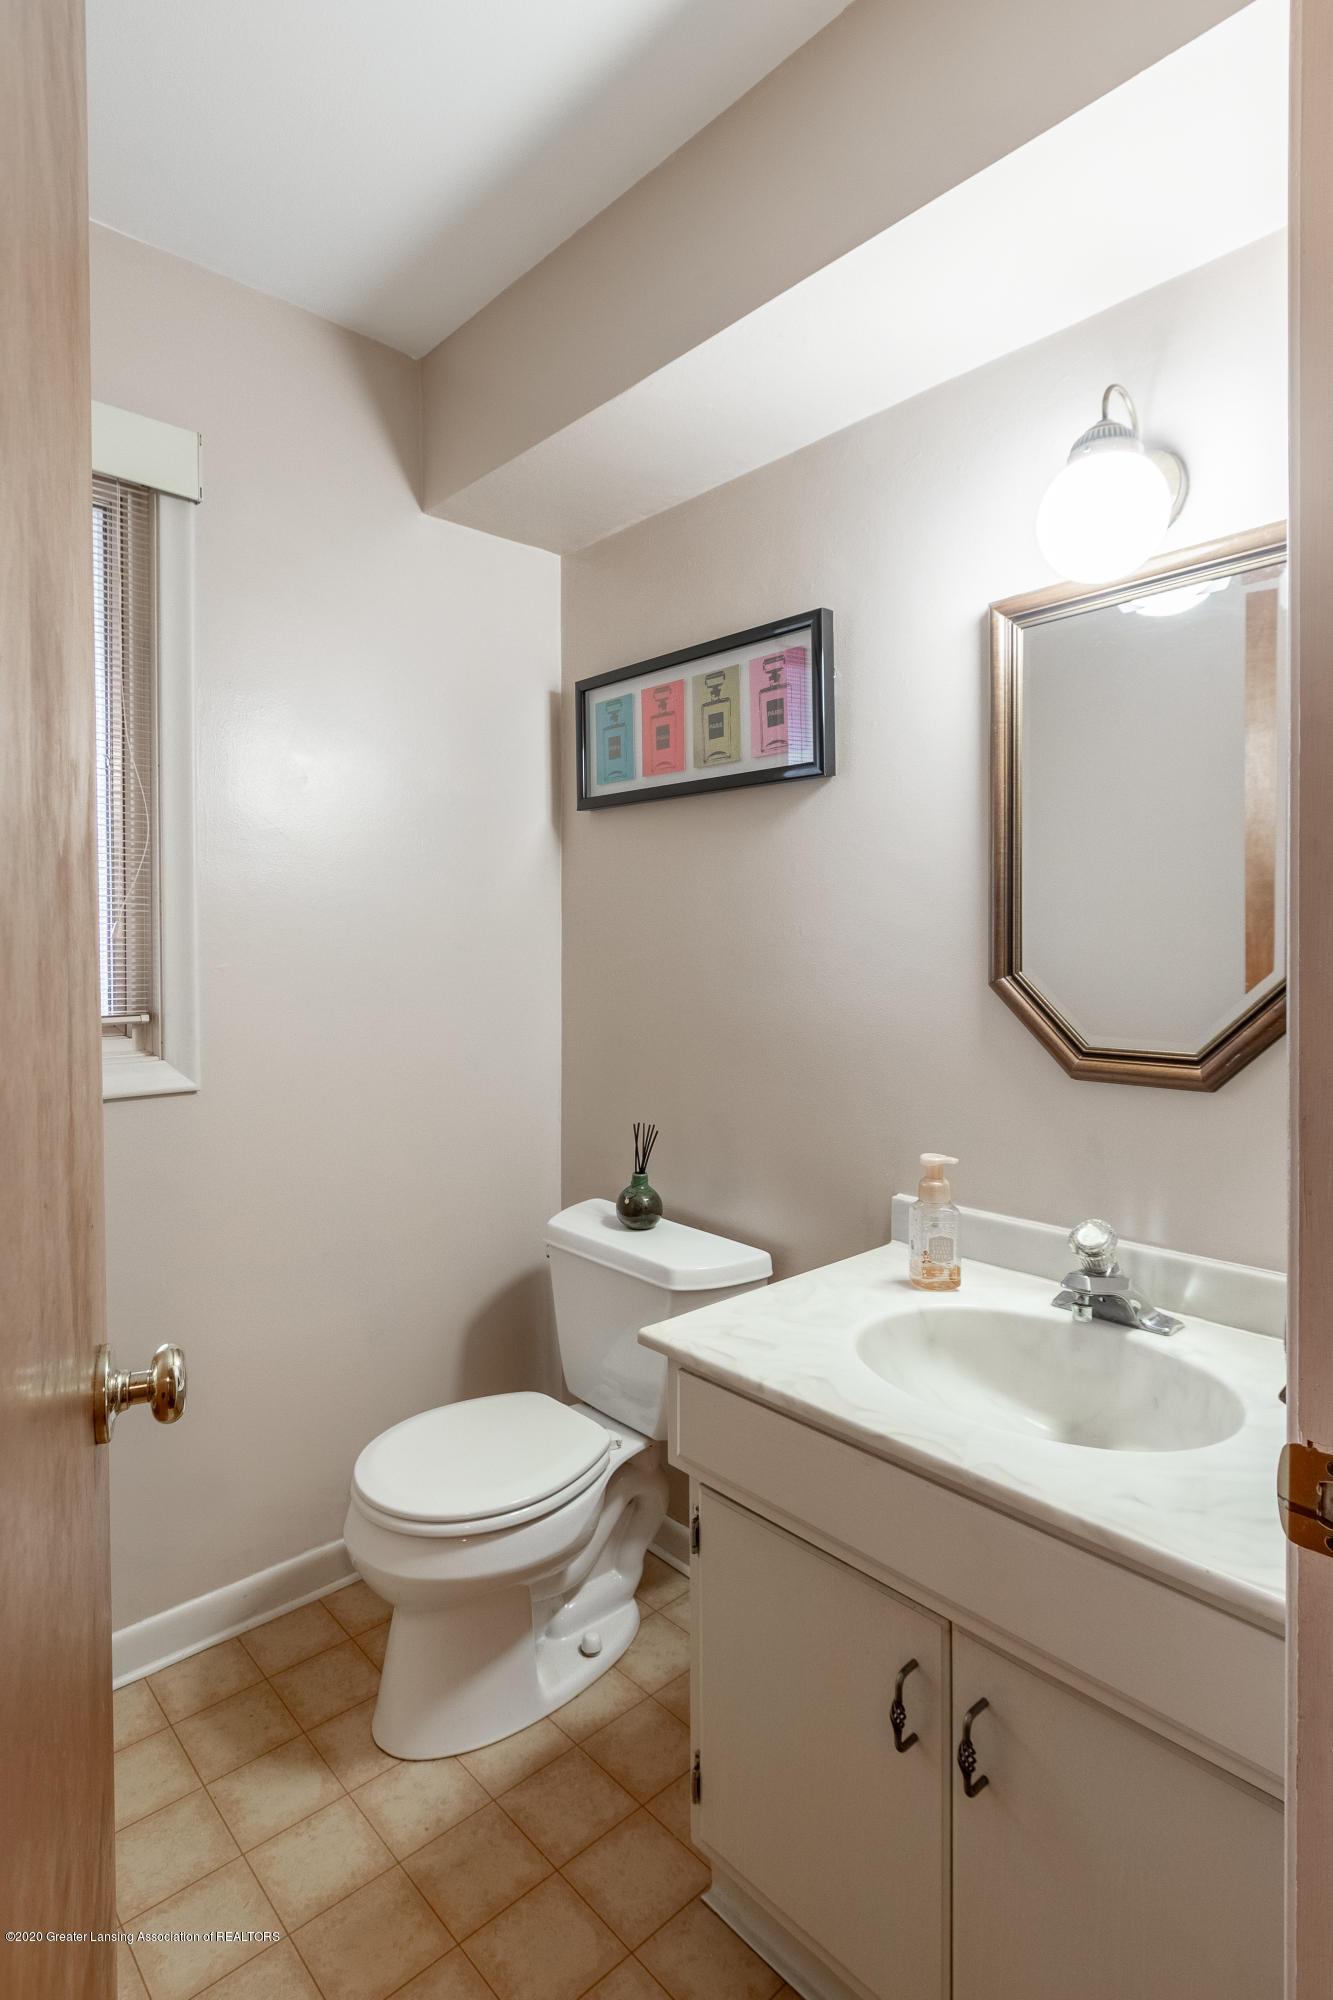 2181 Riverwood Dr - Bathroom - 30